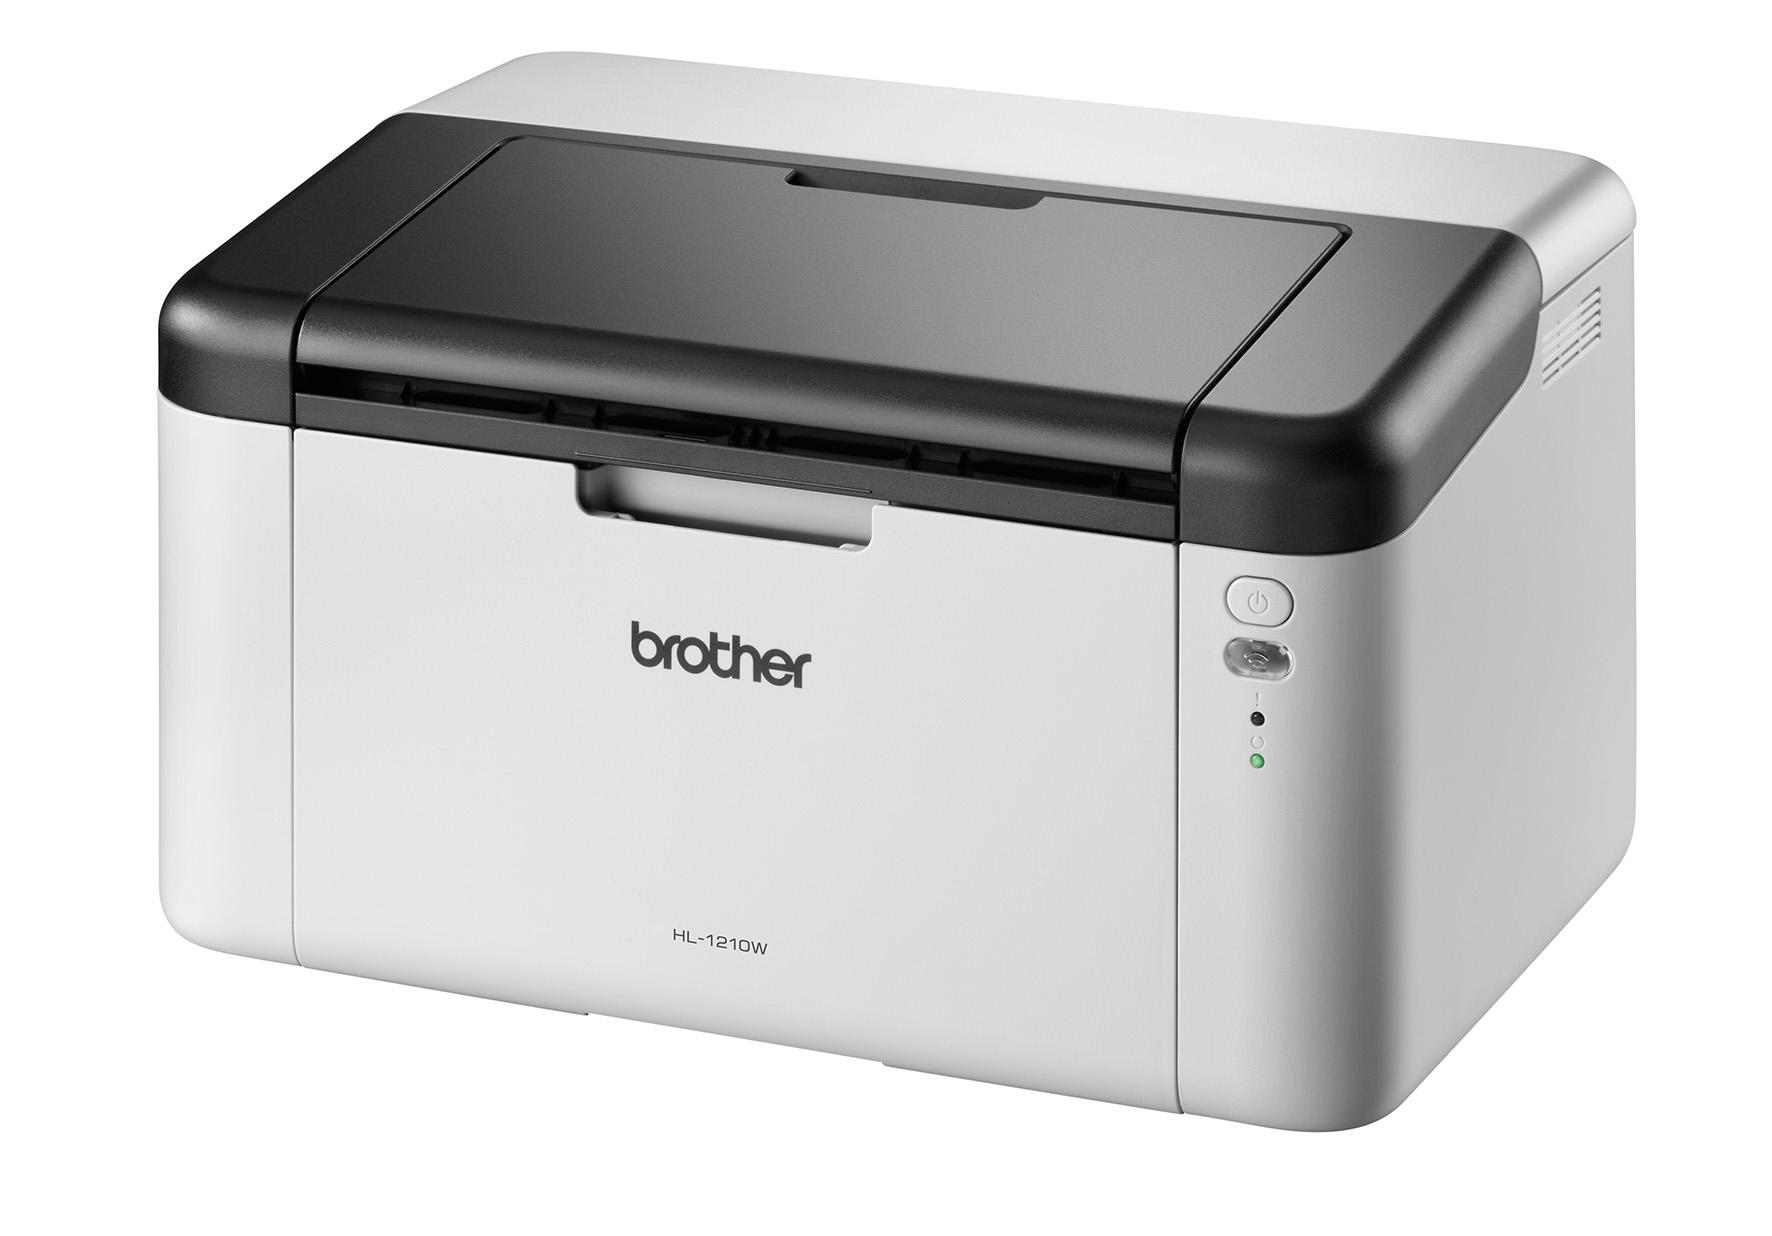 BROTHER HL-1210W A4 monochrom Laserdrucker 20ppm 2400x600pi 150 Blatt Papierzufuhr Wlan